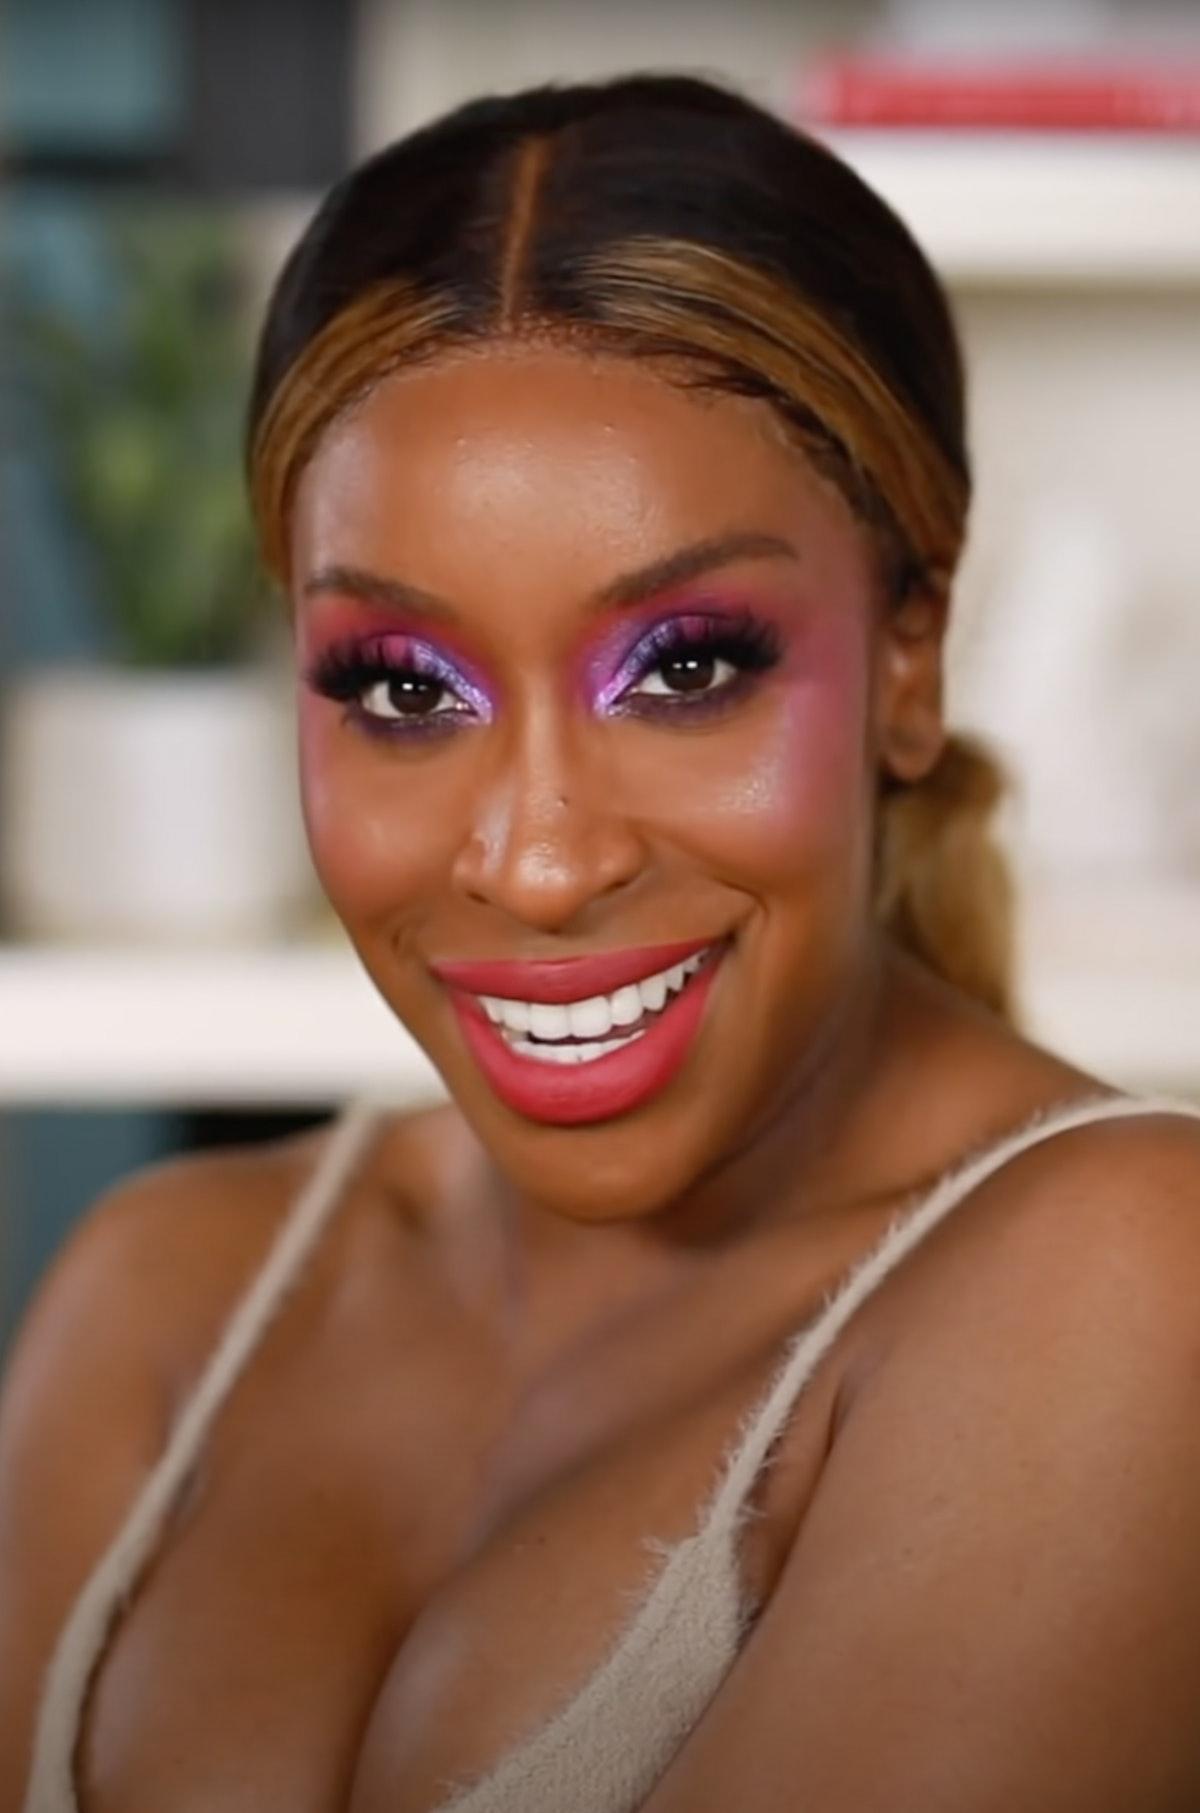 Jackie Aina rocking holographic purple eyeshadow and a rosy blush.